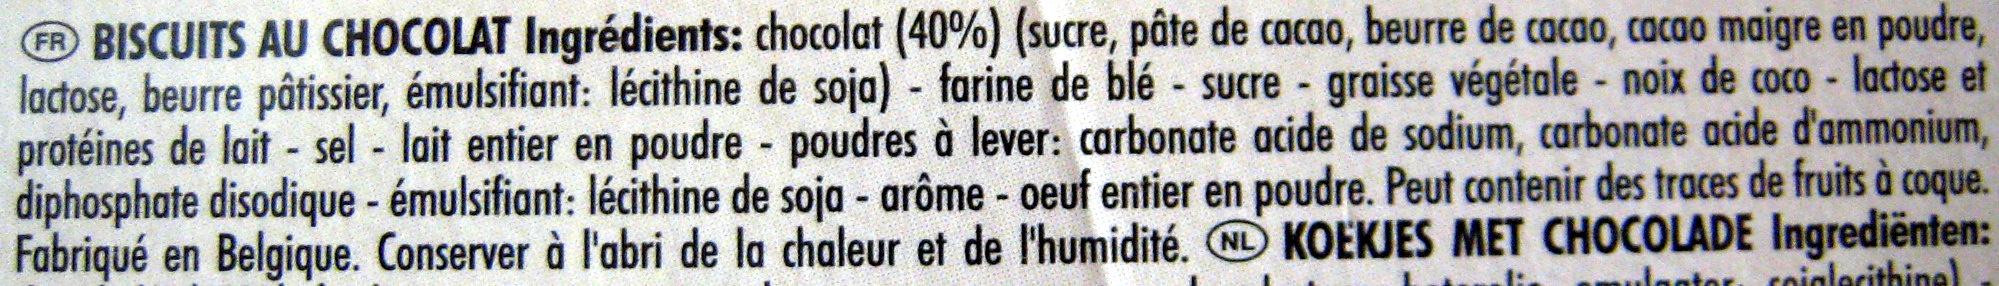 DéliChoc chocolat croustillant noir (lot de 3) - Ingrediënten